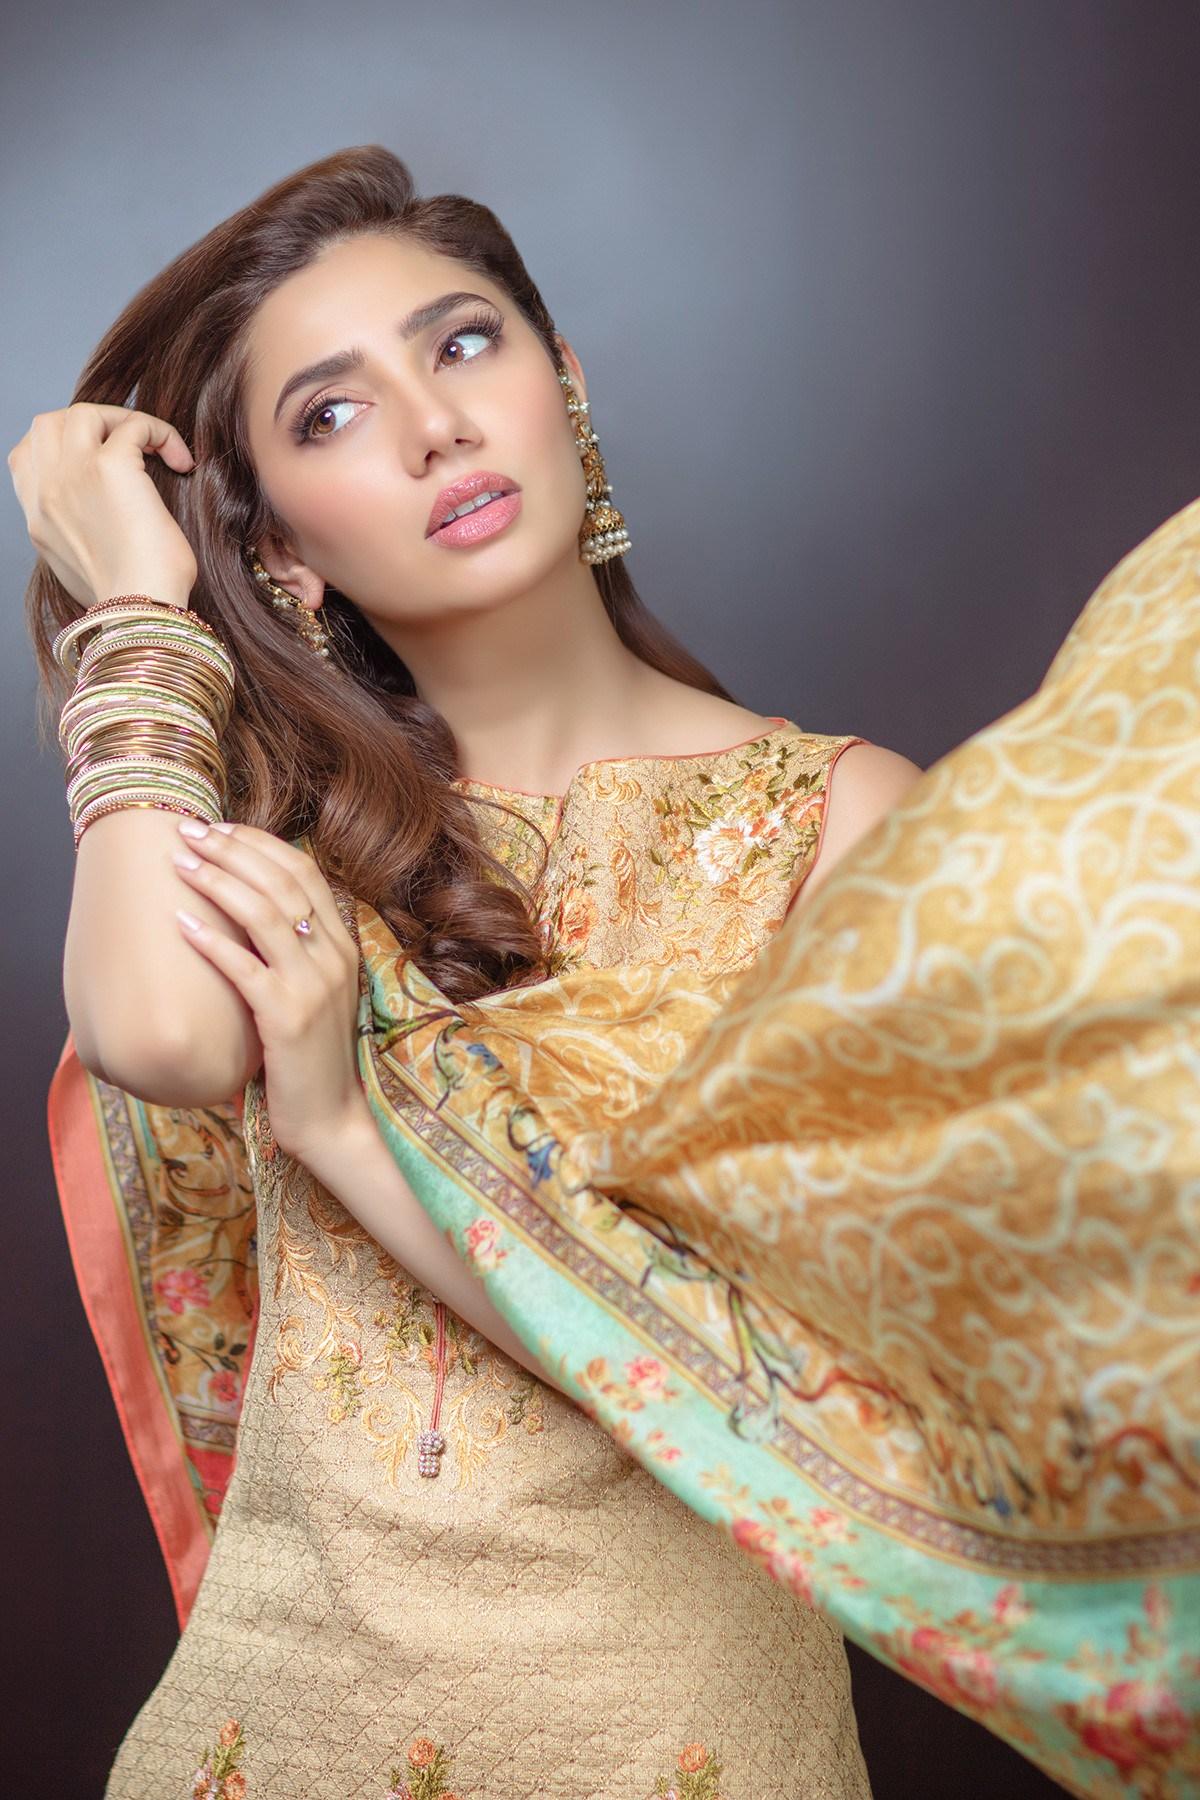 Cute Brand Wallpapers Mahira Khan Dazzles In Alkaram S Eid Collection Reviewit Pk